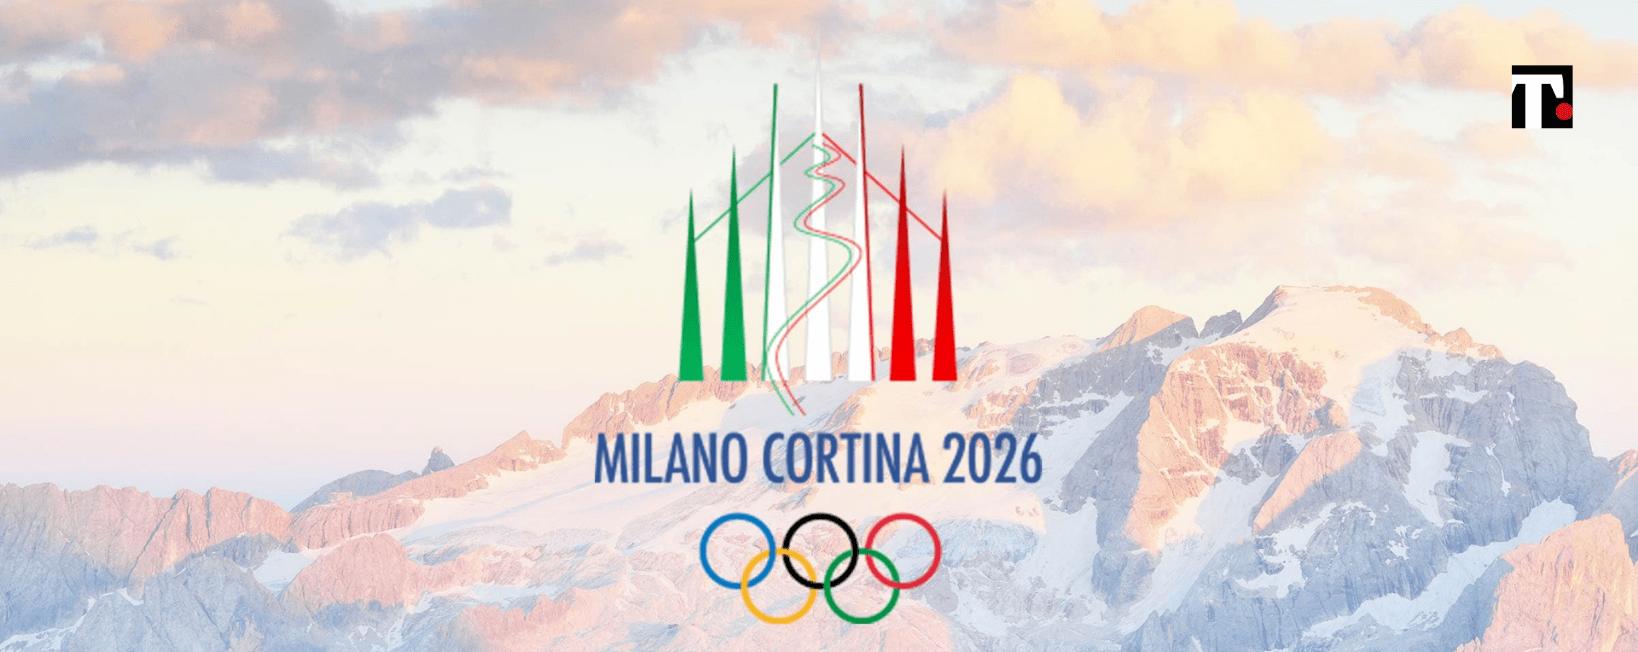 Infrastrutture Milano Cortina 2026 Spa